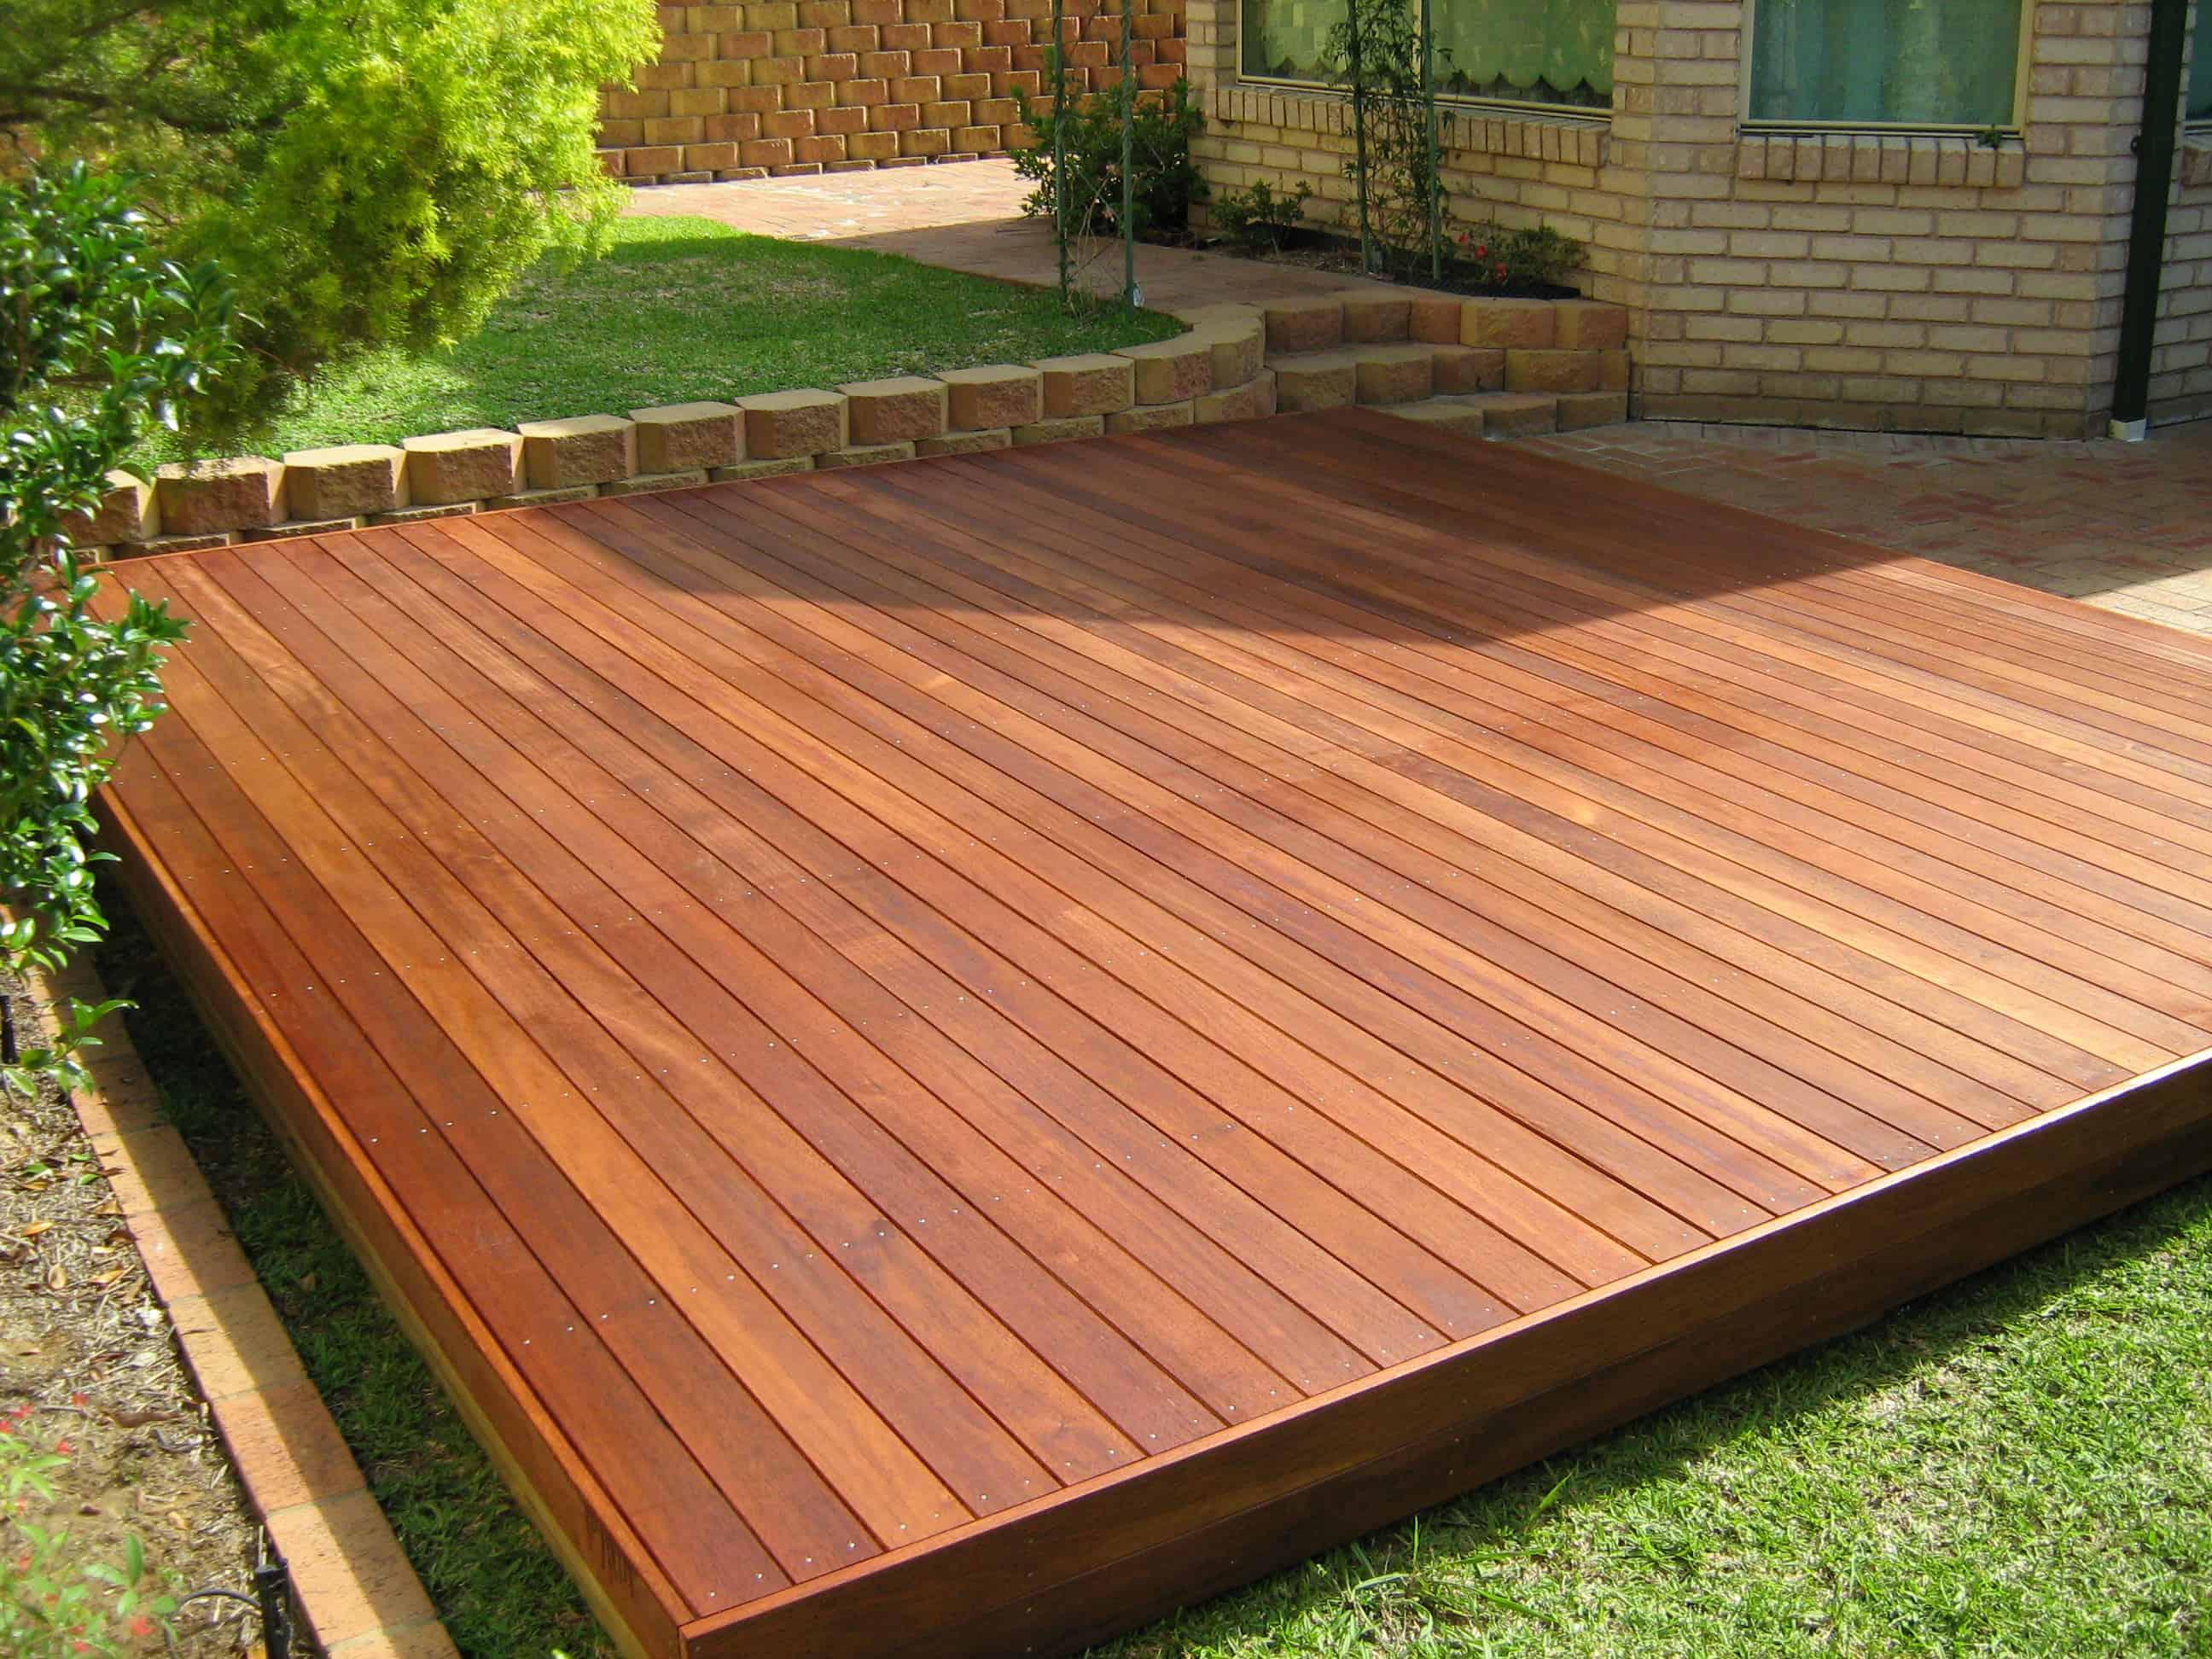 Backyard Style: Floating Decks - Decks & Docks Lumber Co. on Floating Patio Ideas id=60164